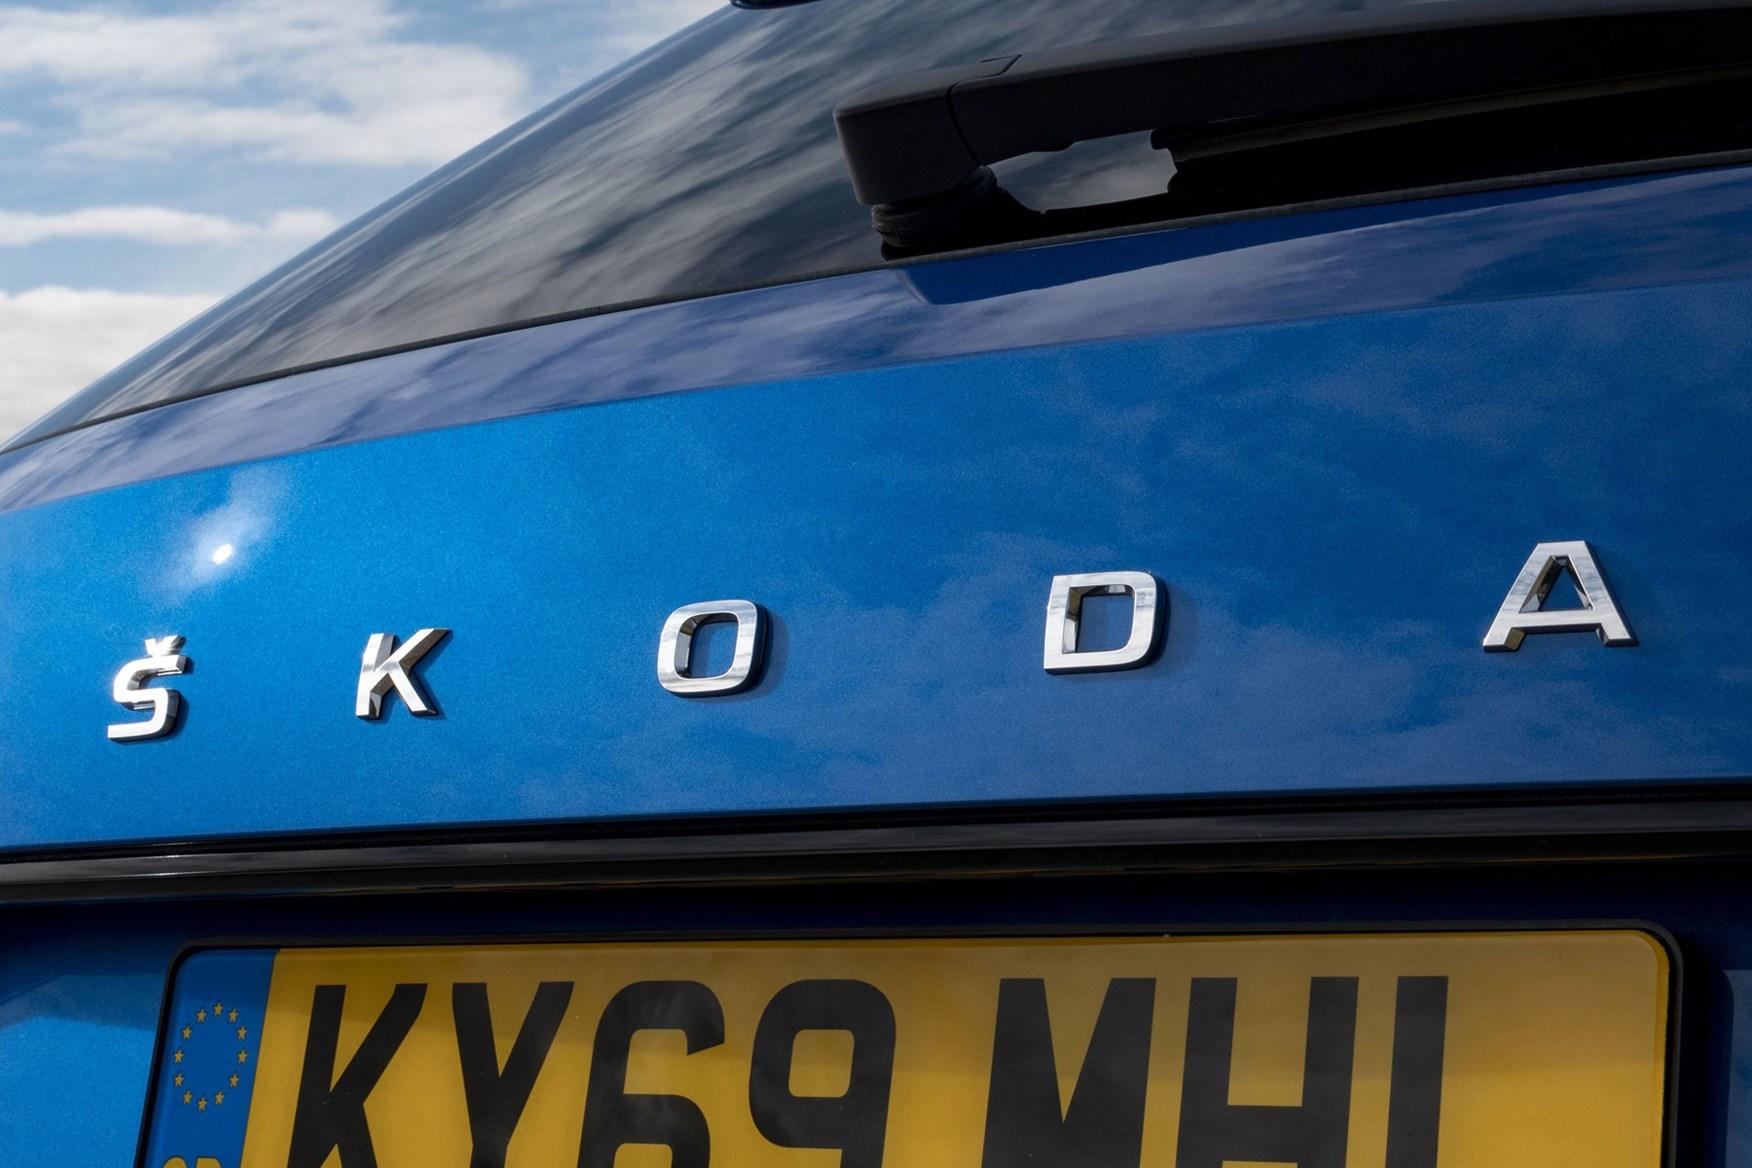 Blue 2019 Skoda Super Estate tailgate badging